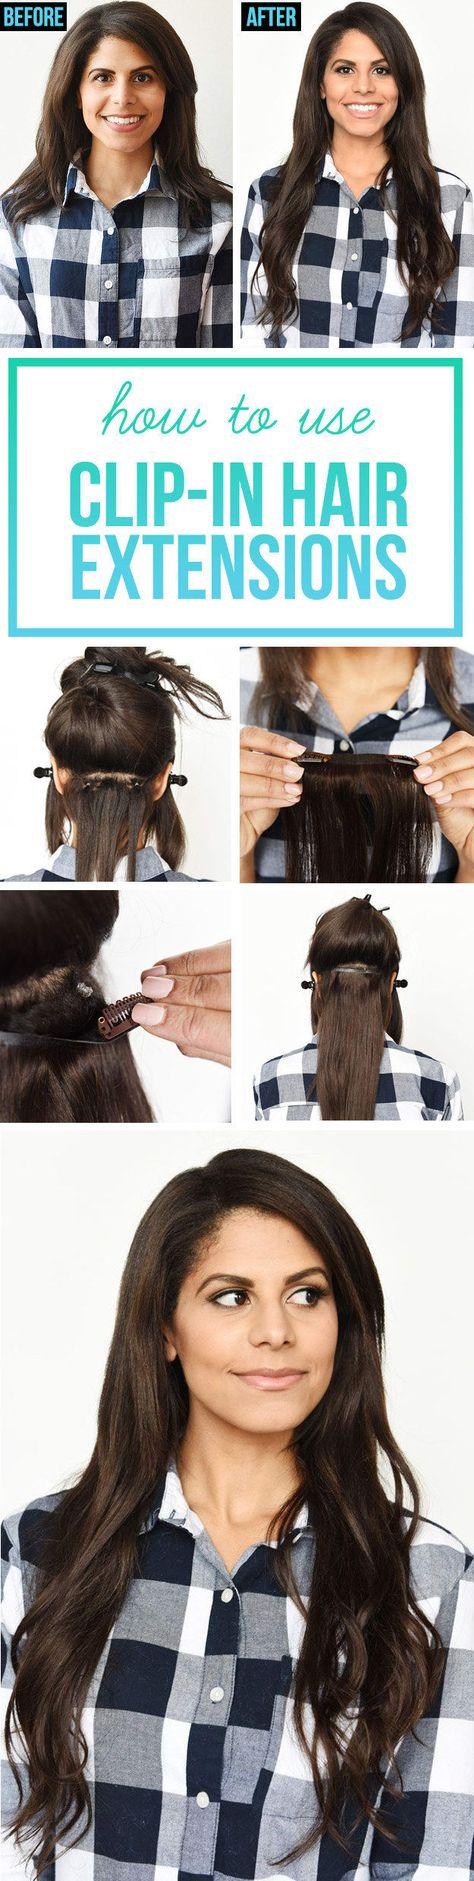 100 Best Hair Images On Pinterest Hair Cut Hairdos And Gorgeous Hair